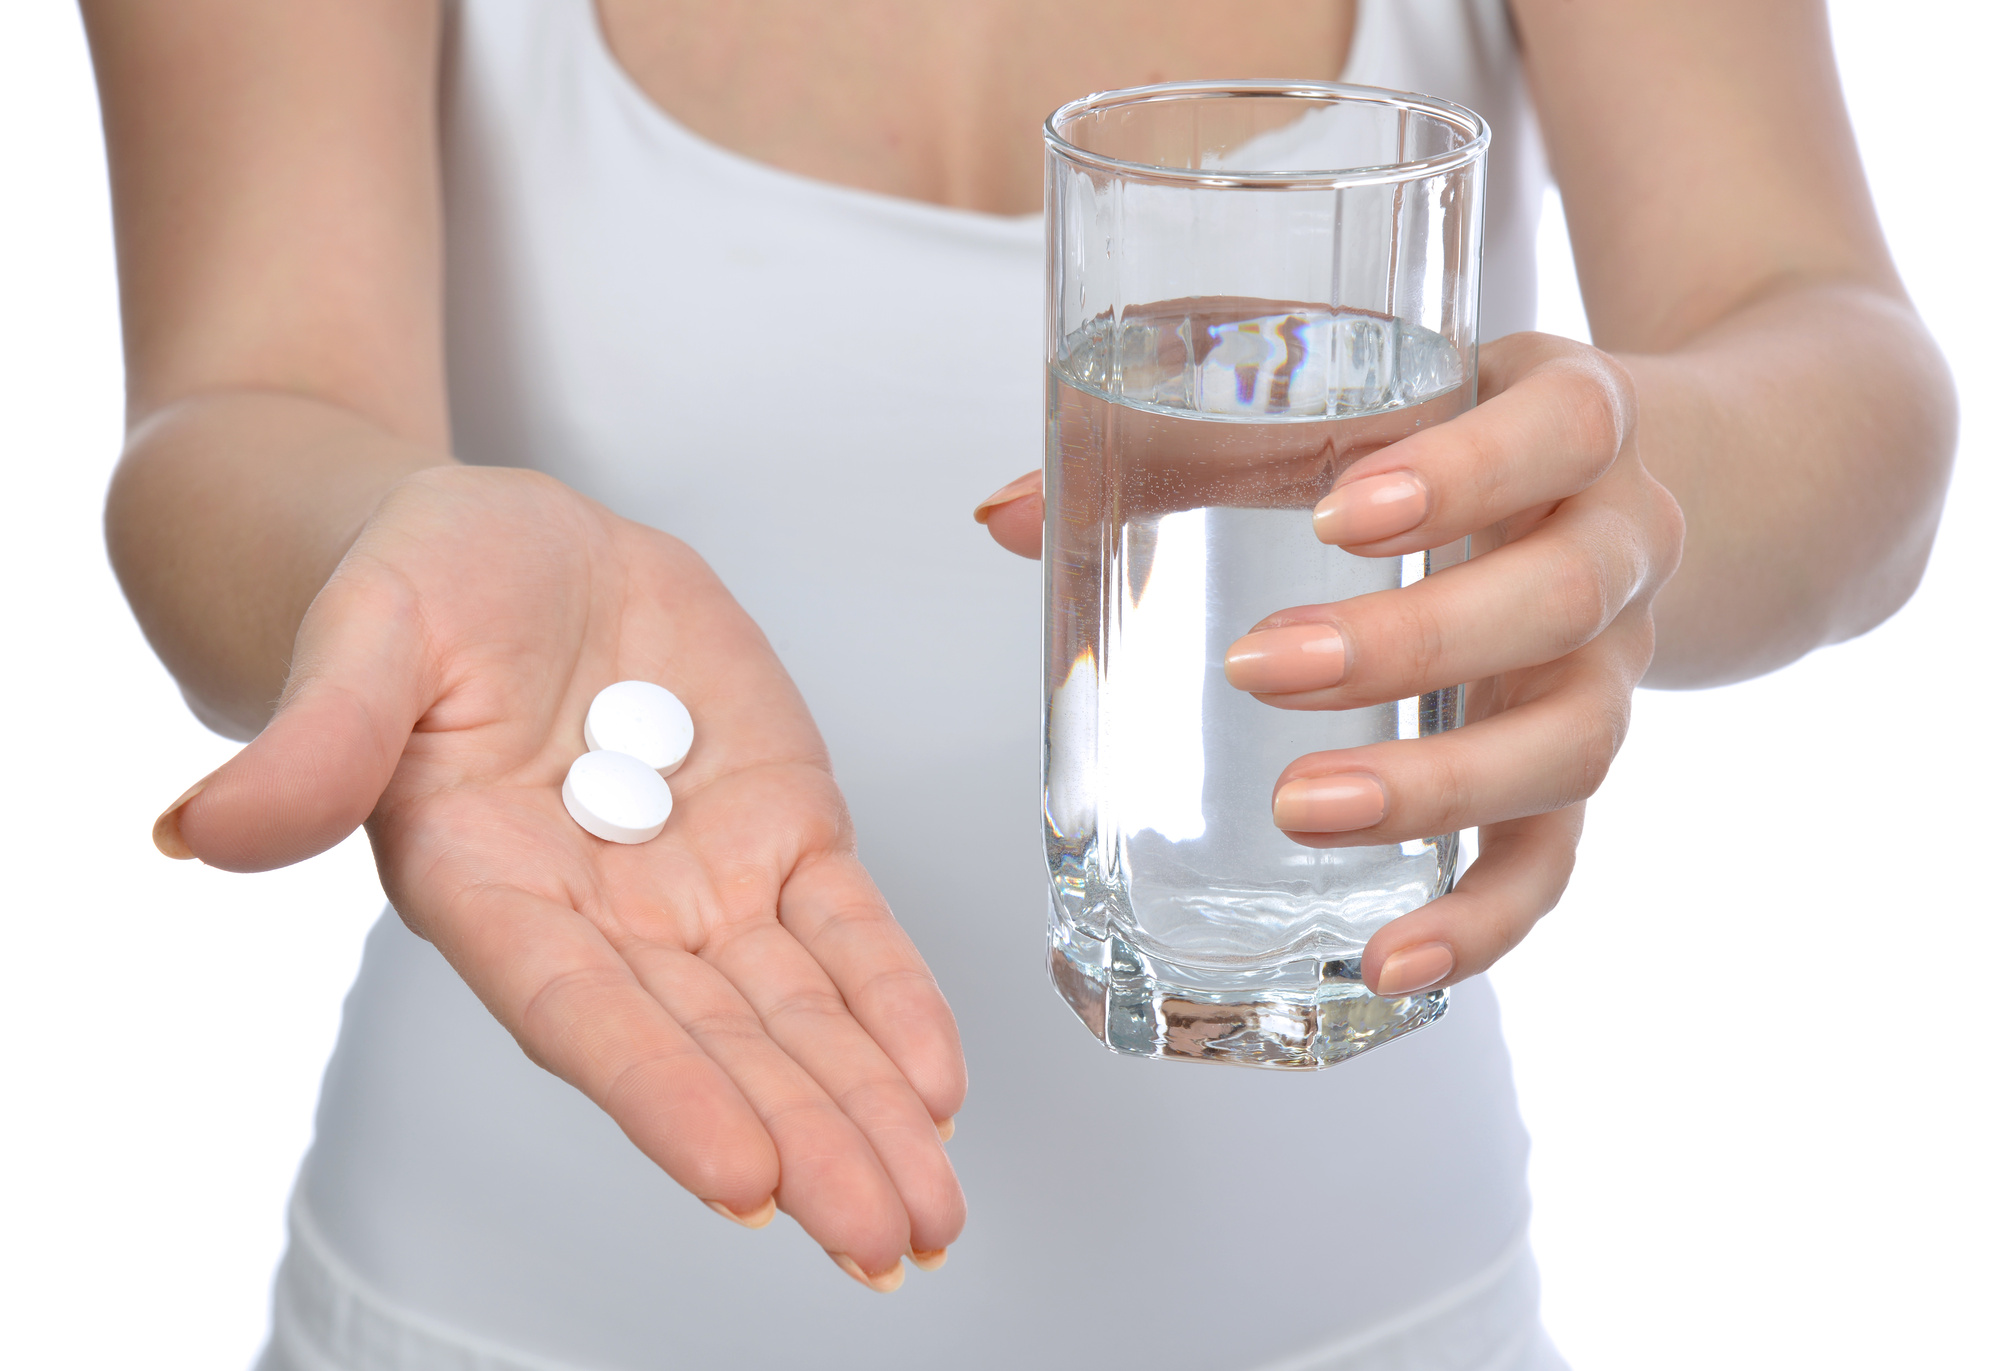 Buy Vicodin Online 10/325 mg – Generic